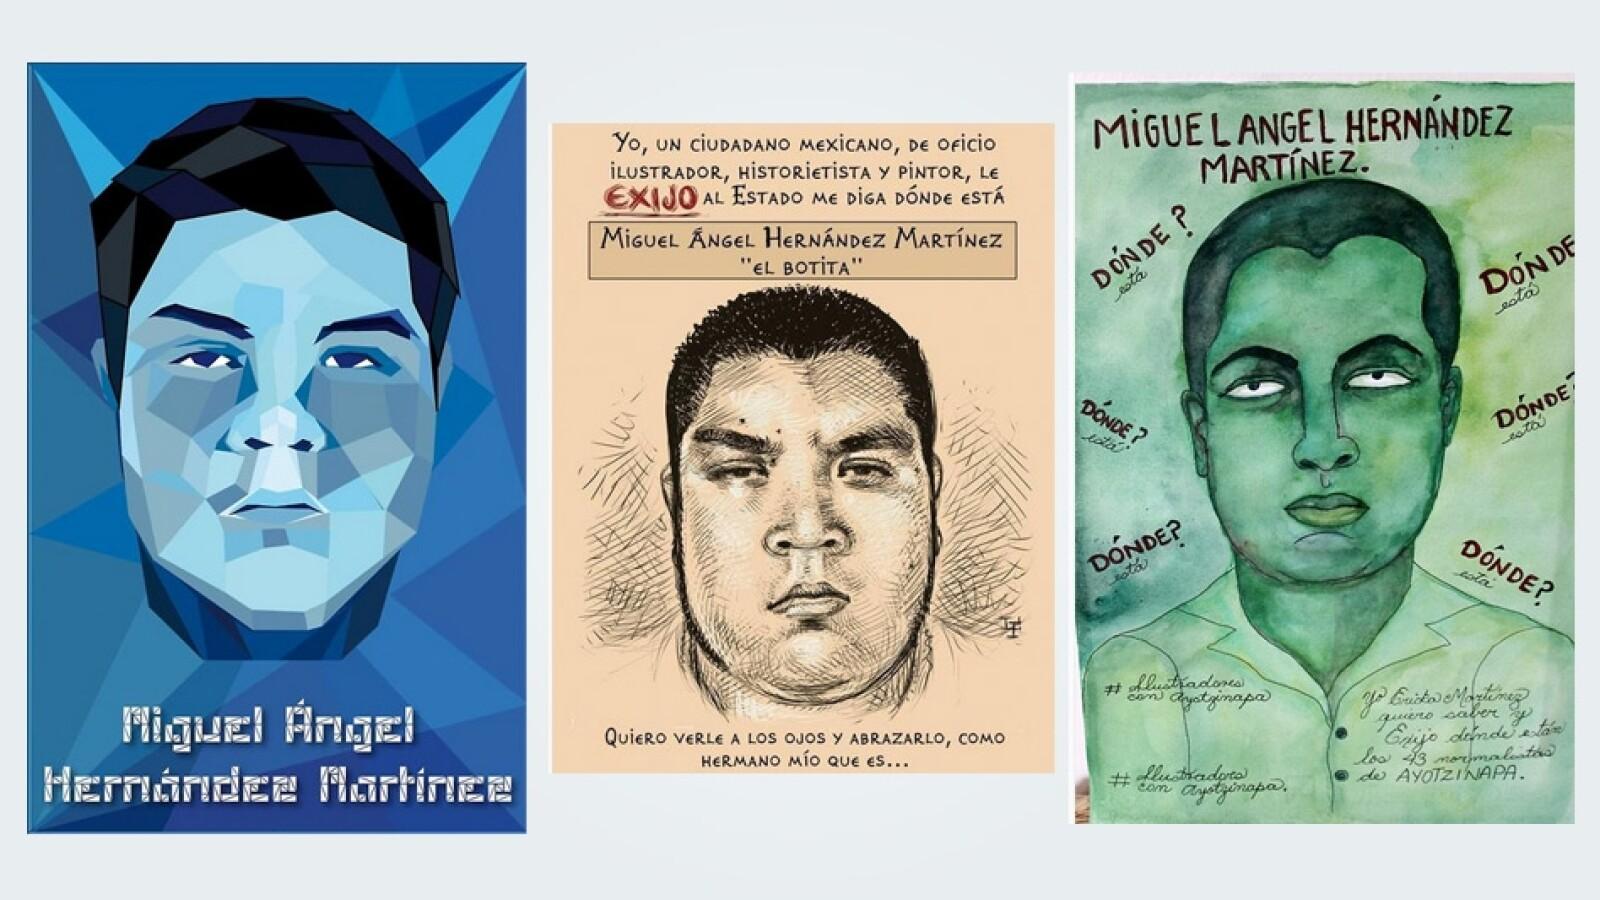 Miguel Angel Hernandez Martinez Ayotzinapa